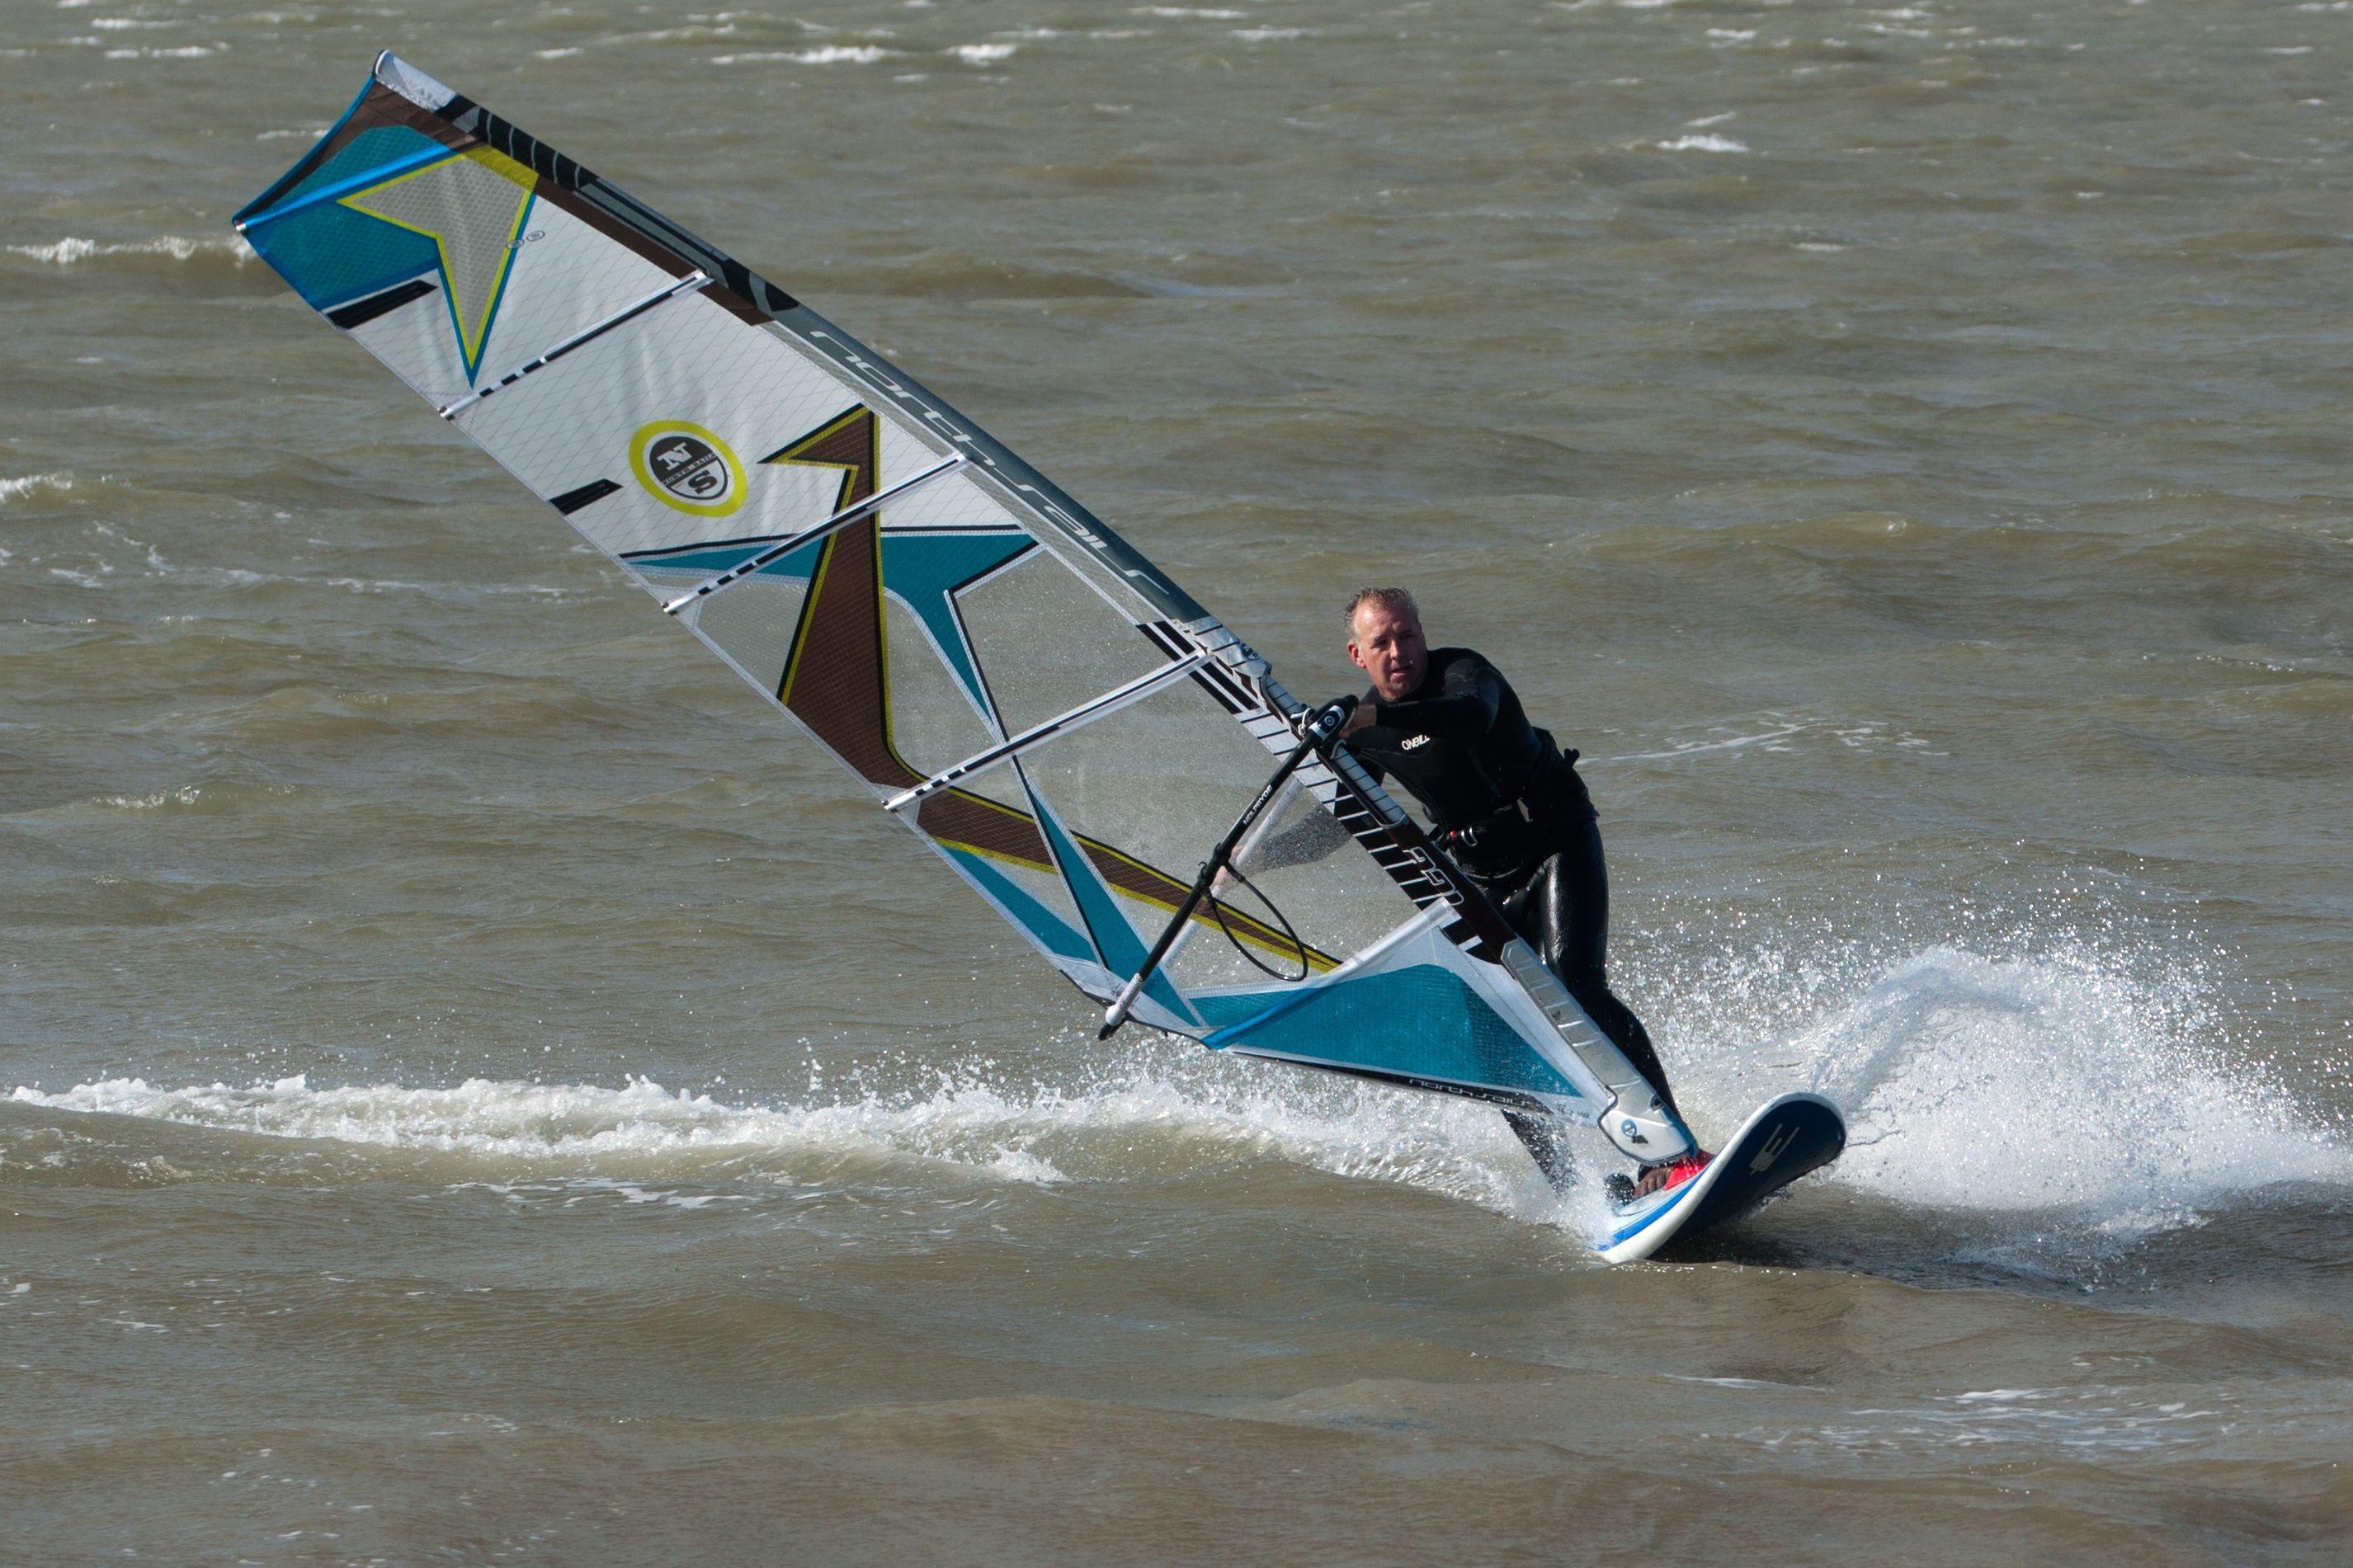 Chalkwell windsurfing thumb nail